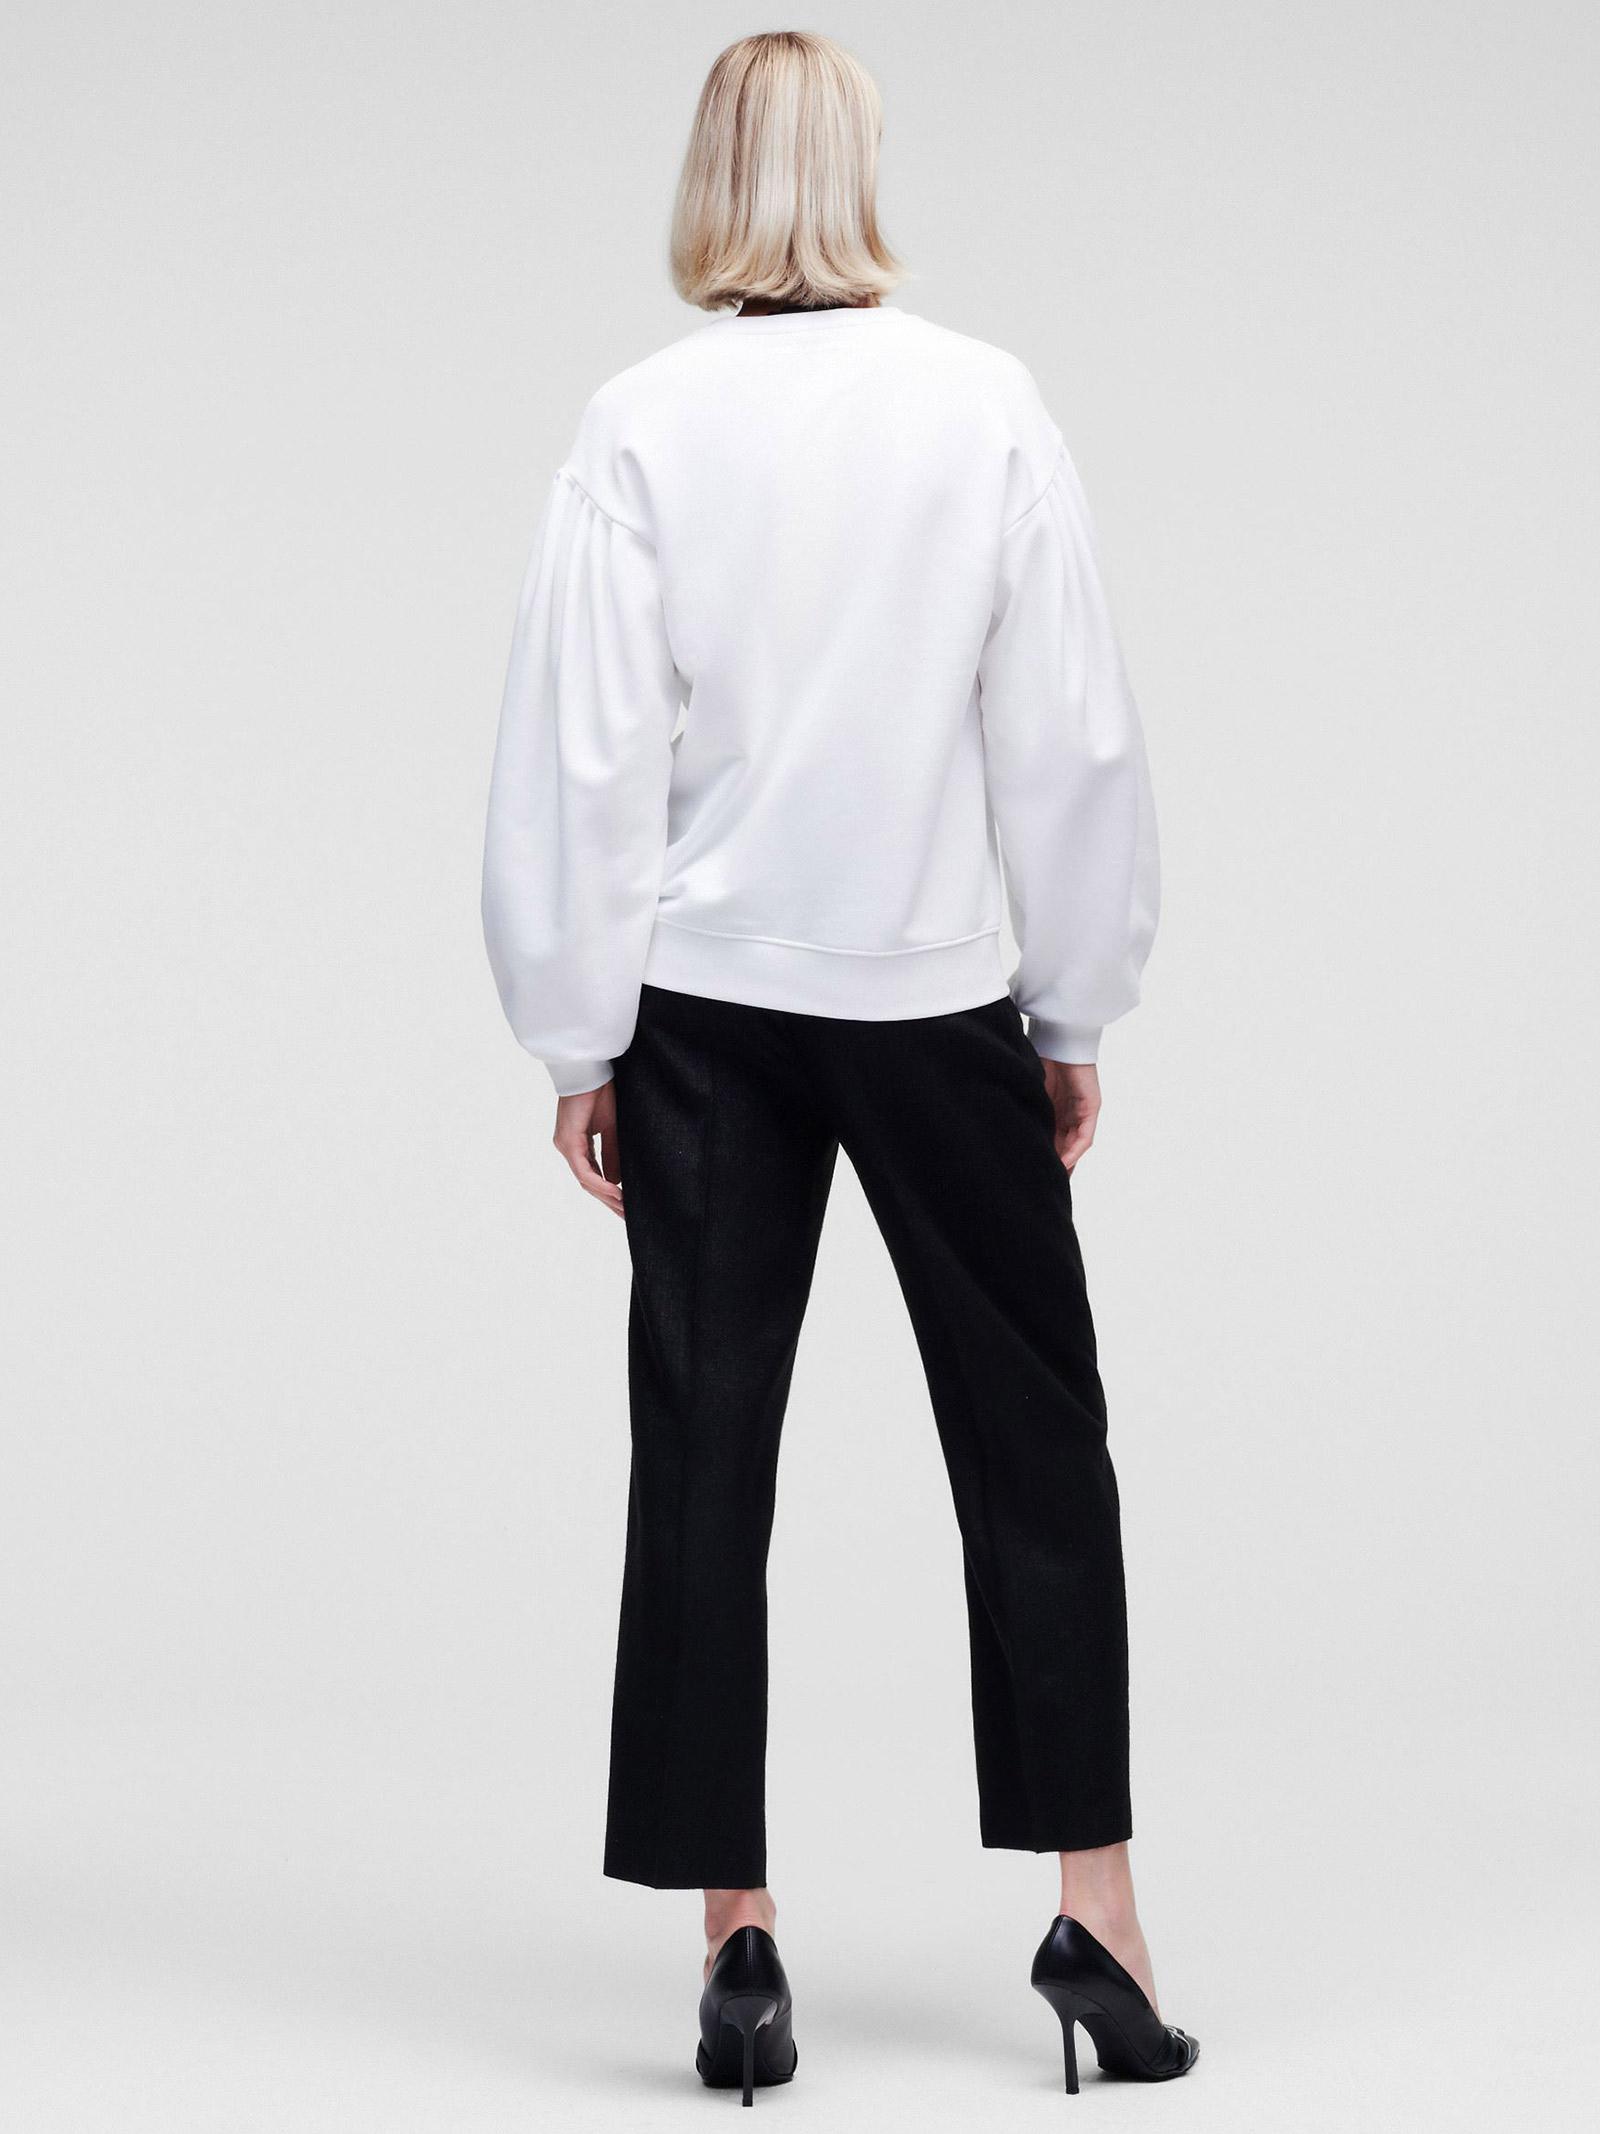 Sweatshirt autograph KARL LAGERFELD | Sweatshirts | 216W1805100